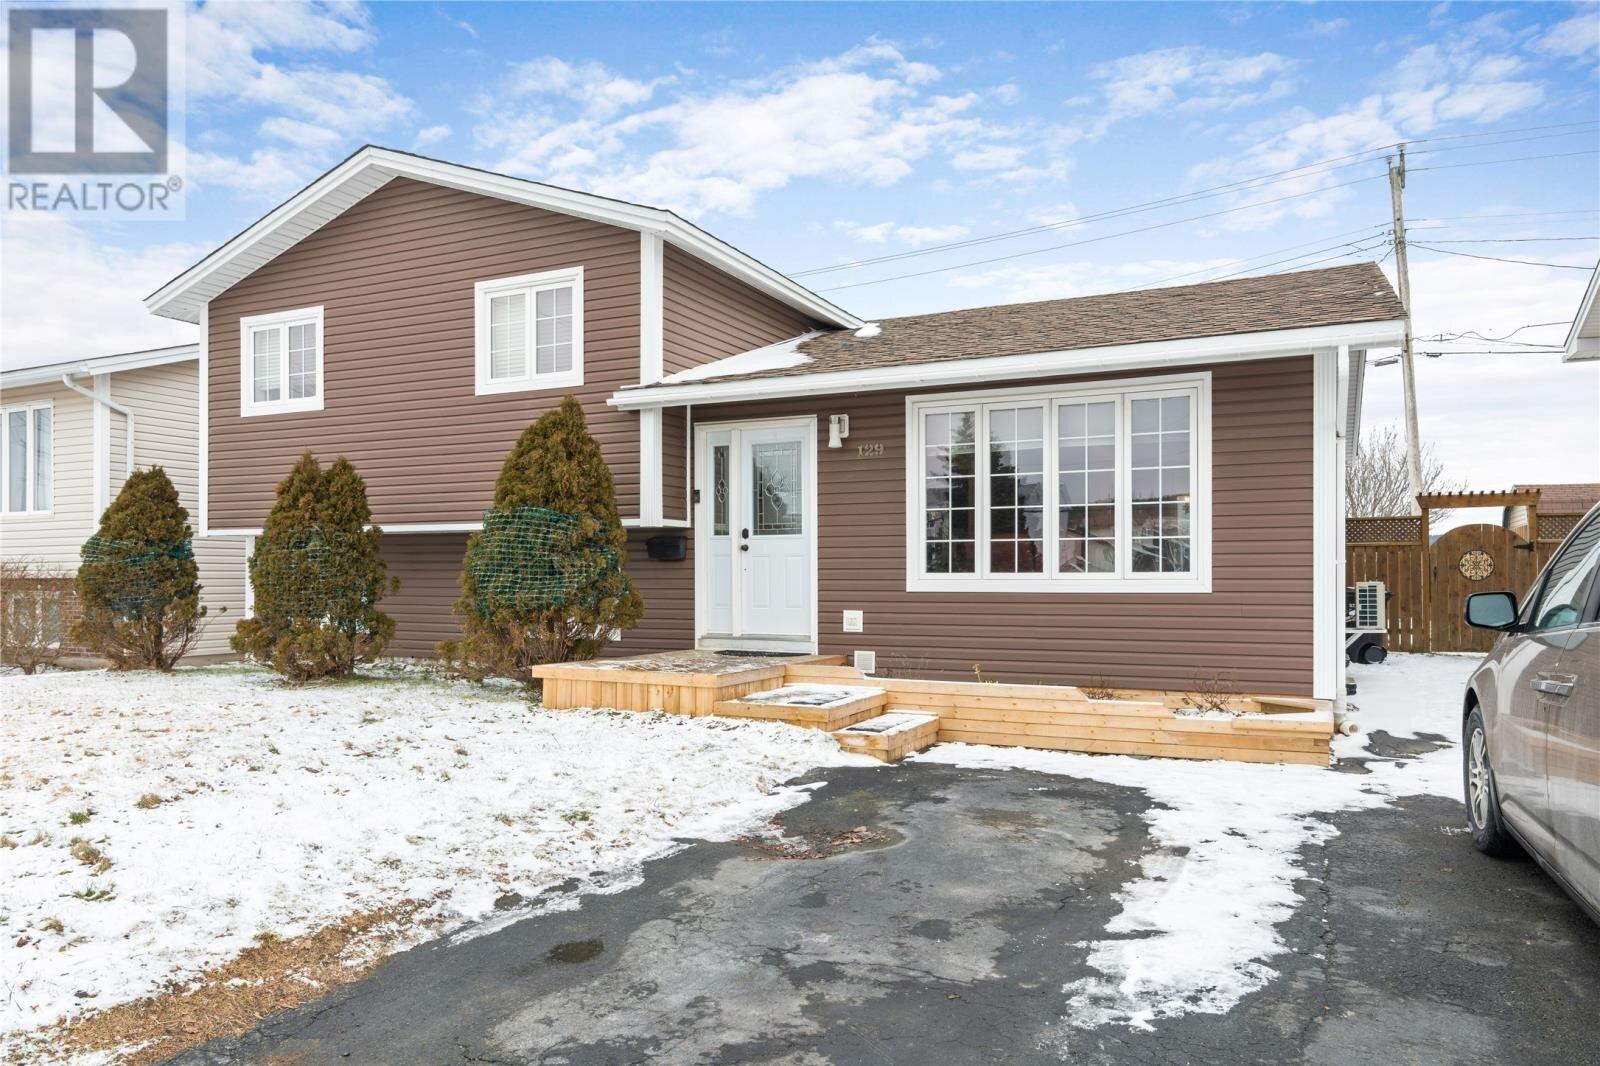 House for sale at 129 Frecker Dr St. John's Newfoundland - MLS: 1224785